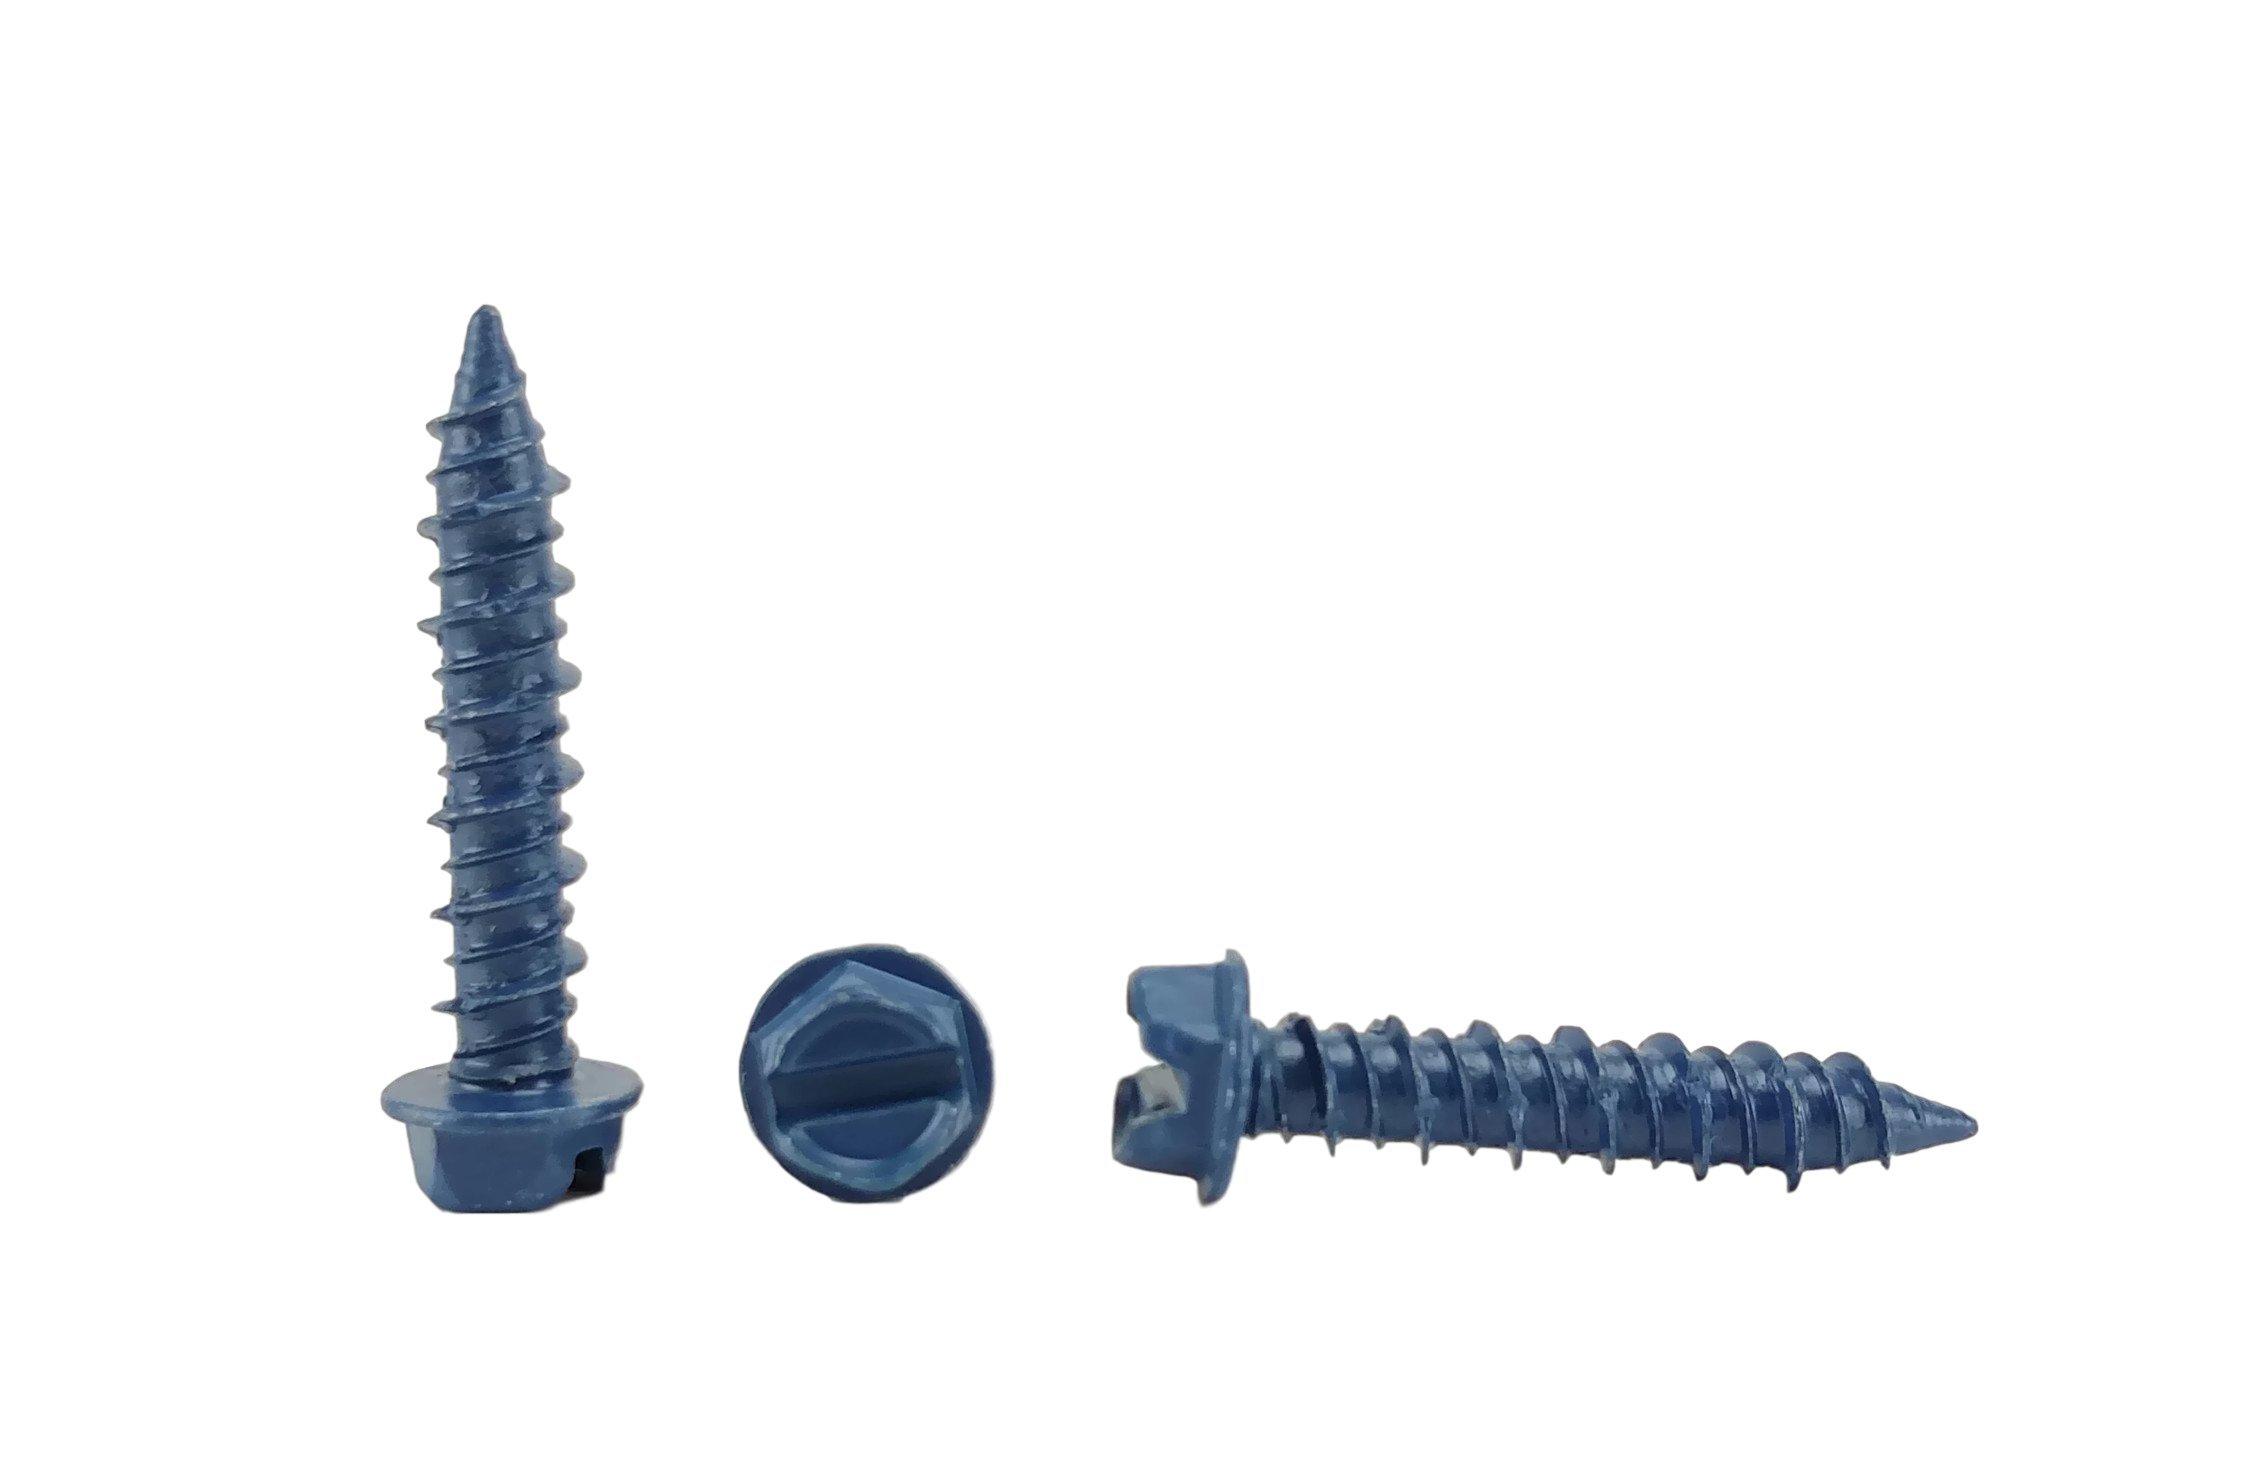 Chenango Supply 1/4 x 1-1/4'' Hex Head Concrete Screw Anchor. 100 pieces With Drill Bit (Miami-Dade Compliant) (1/4 x 1-1/4)